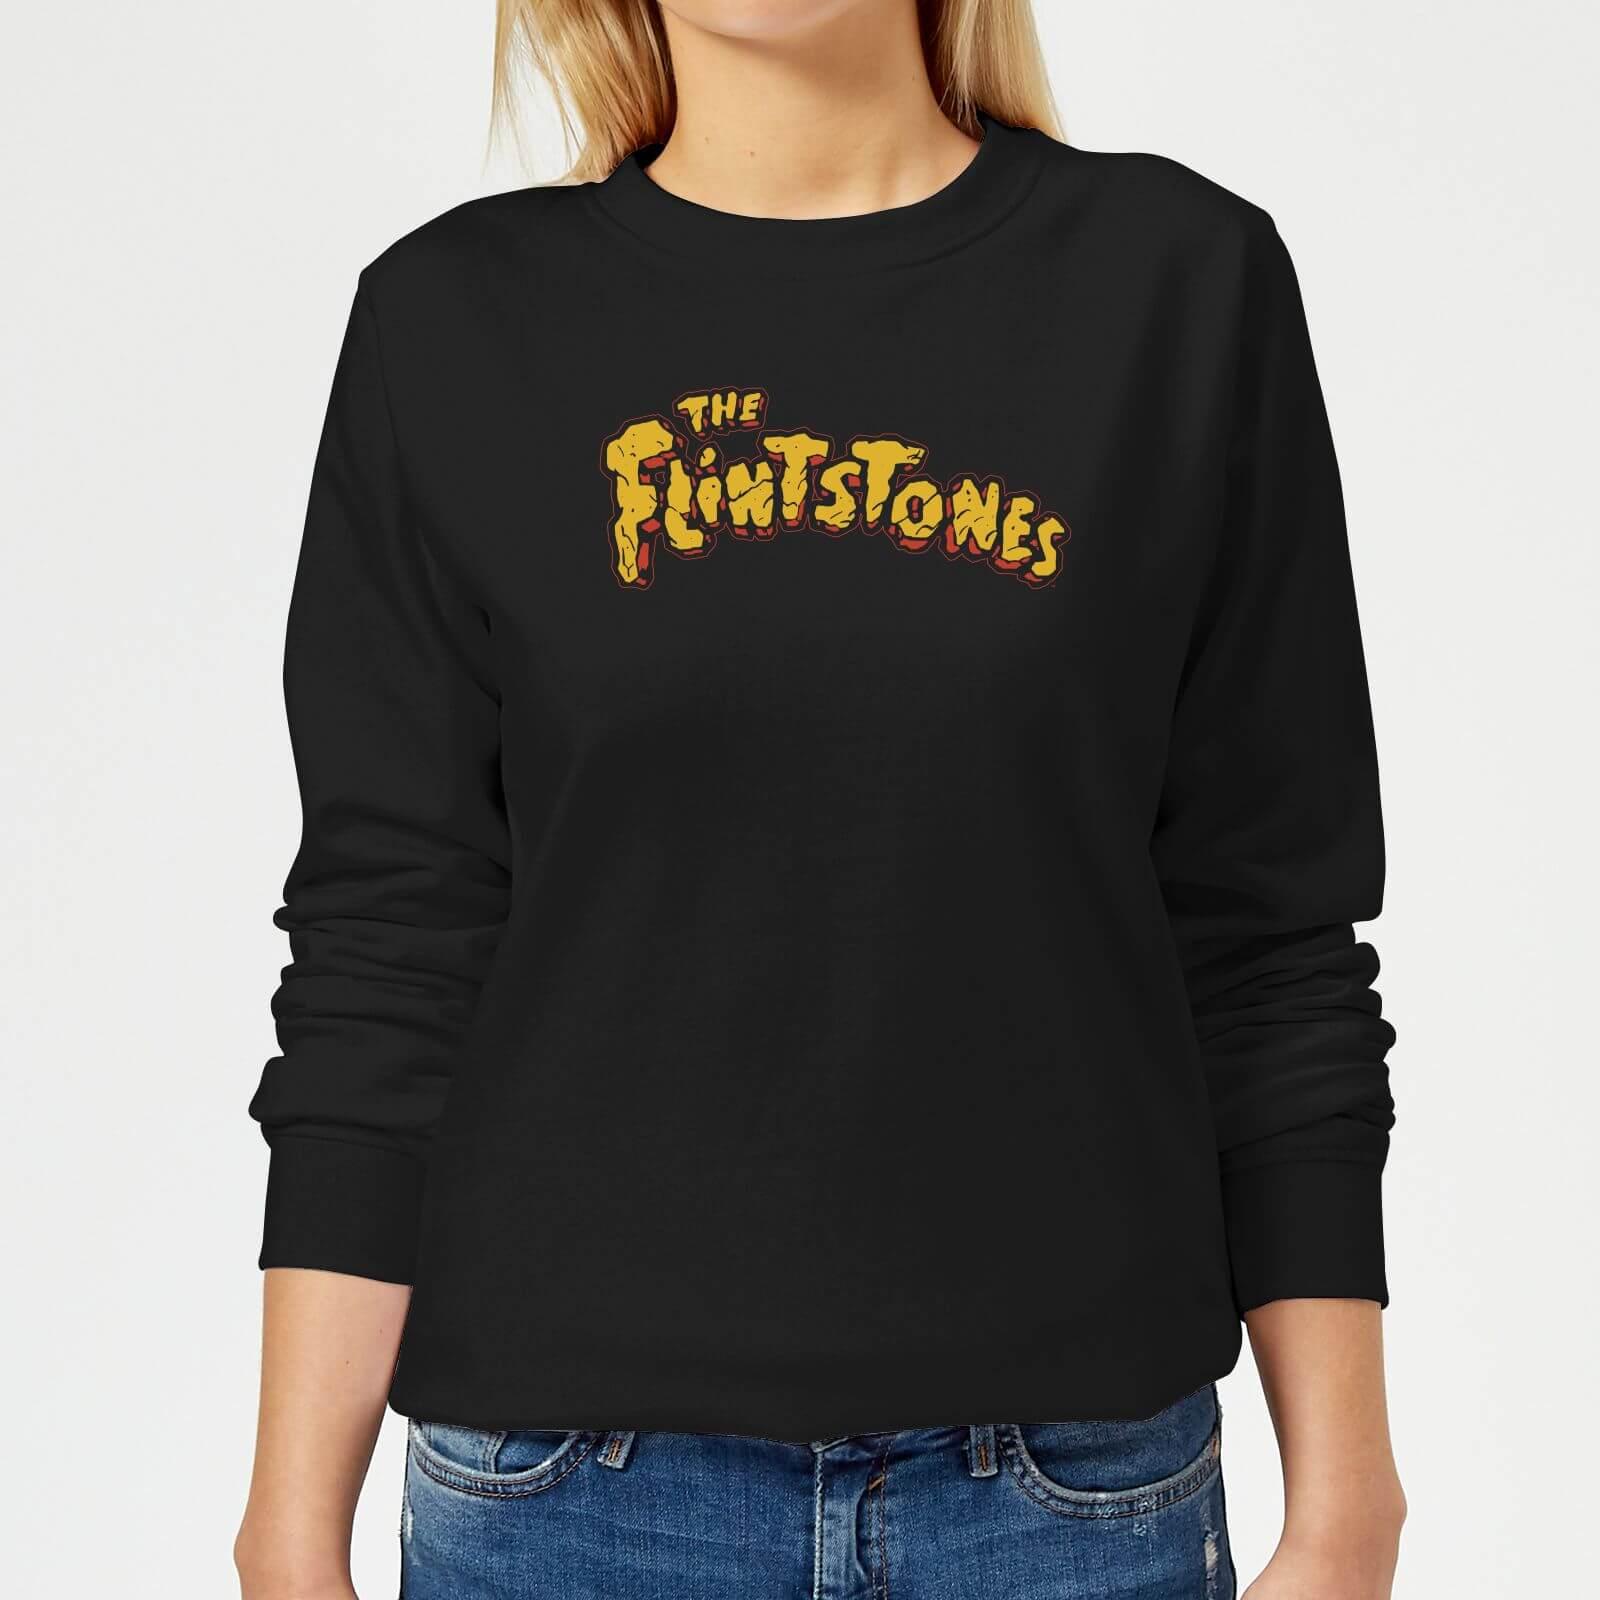 The Flintstones Logo Women's Sweatshirt - Black - M - Black